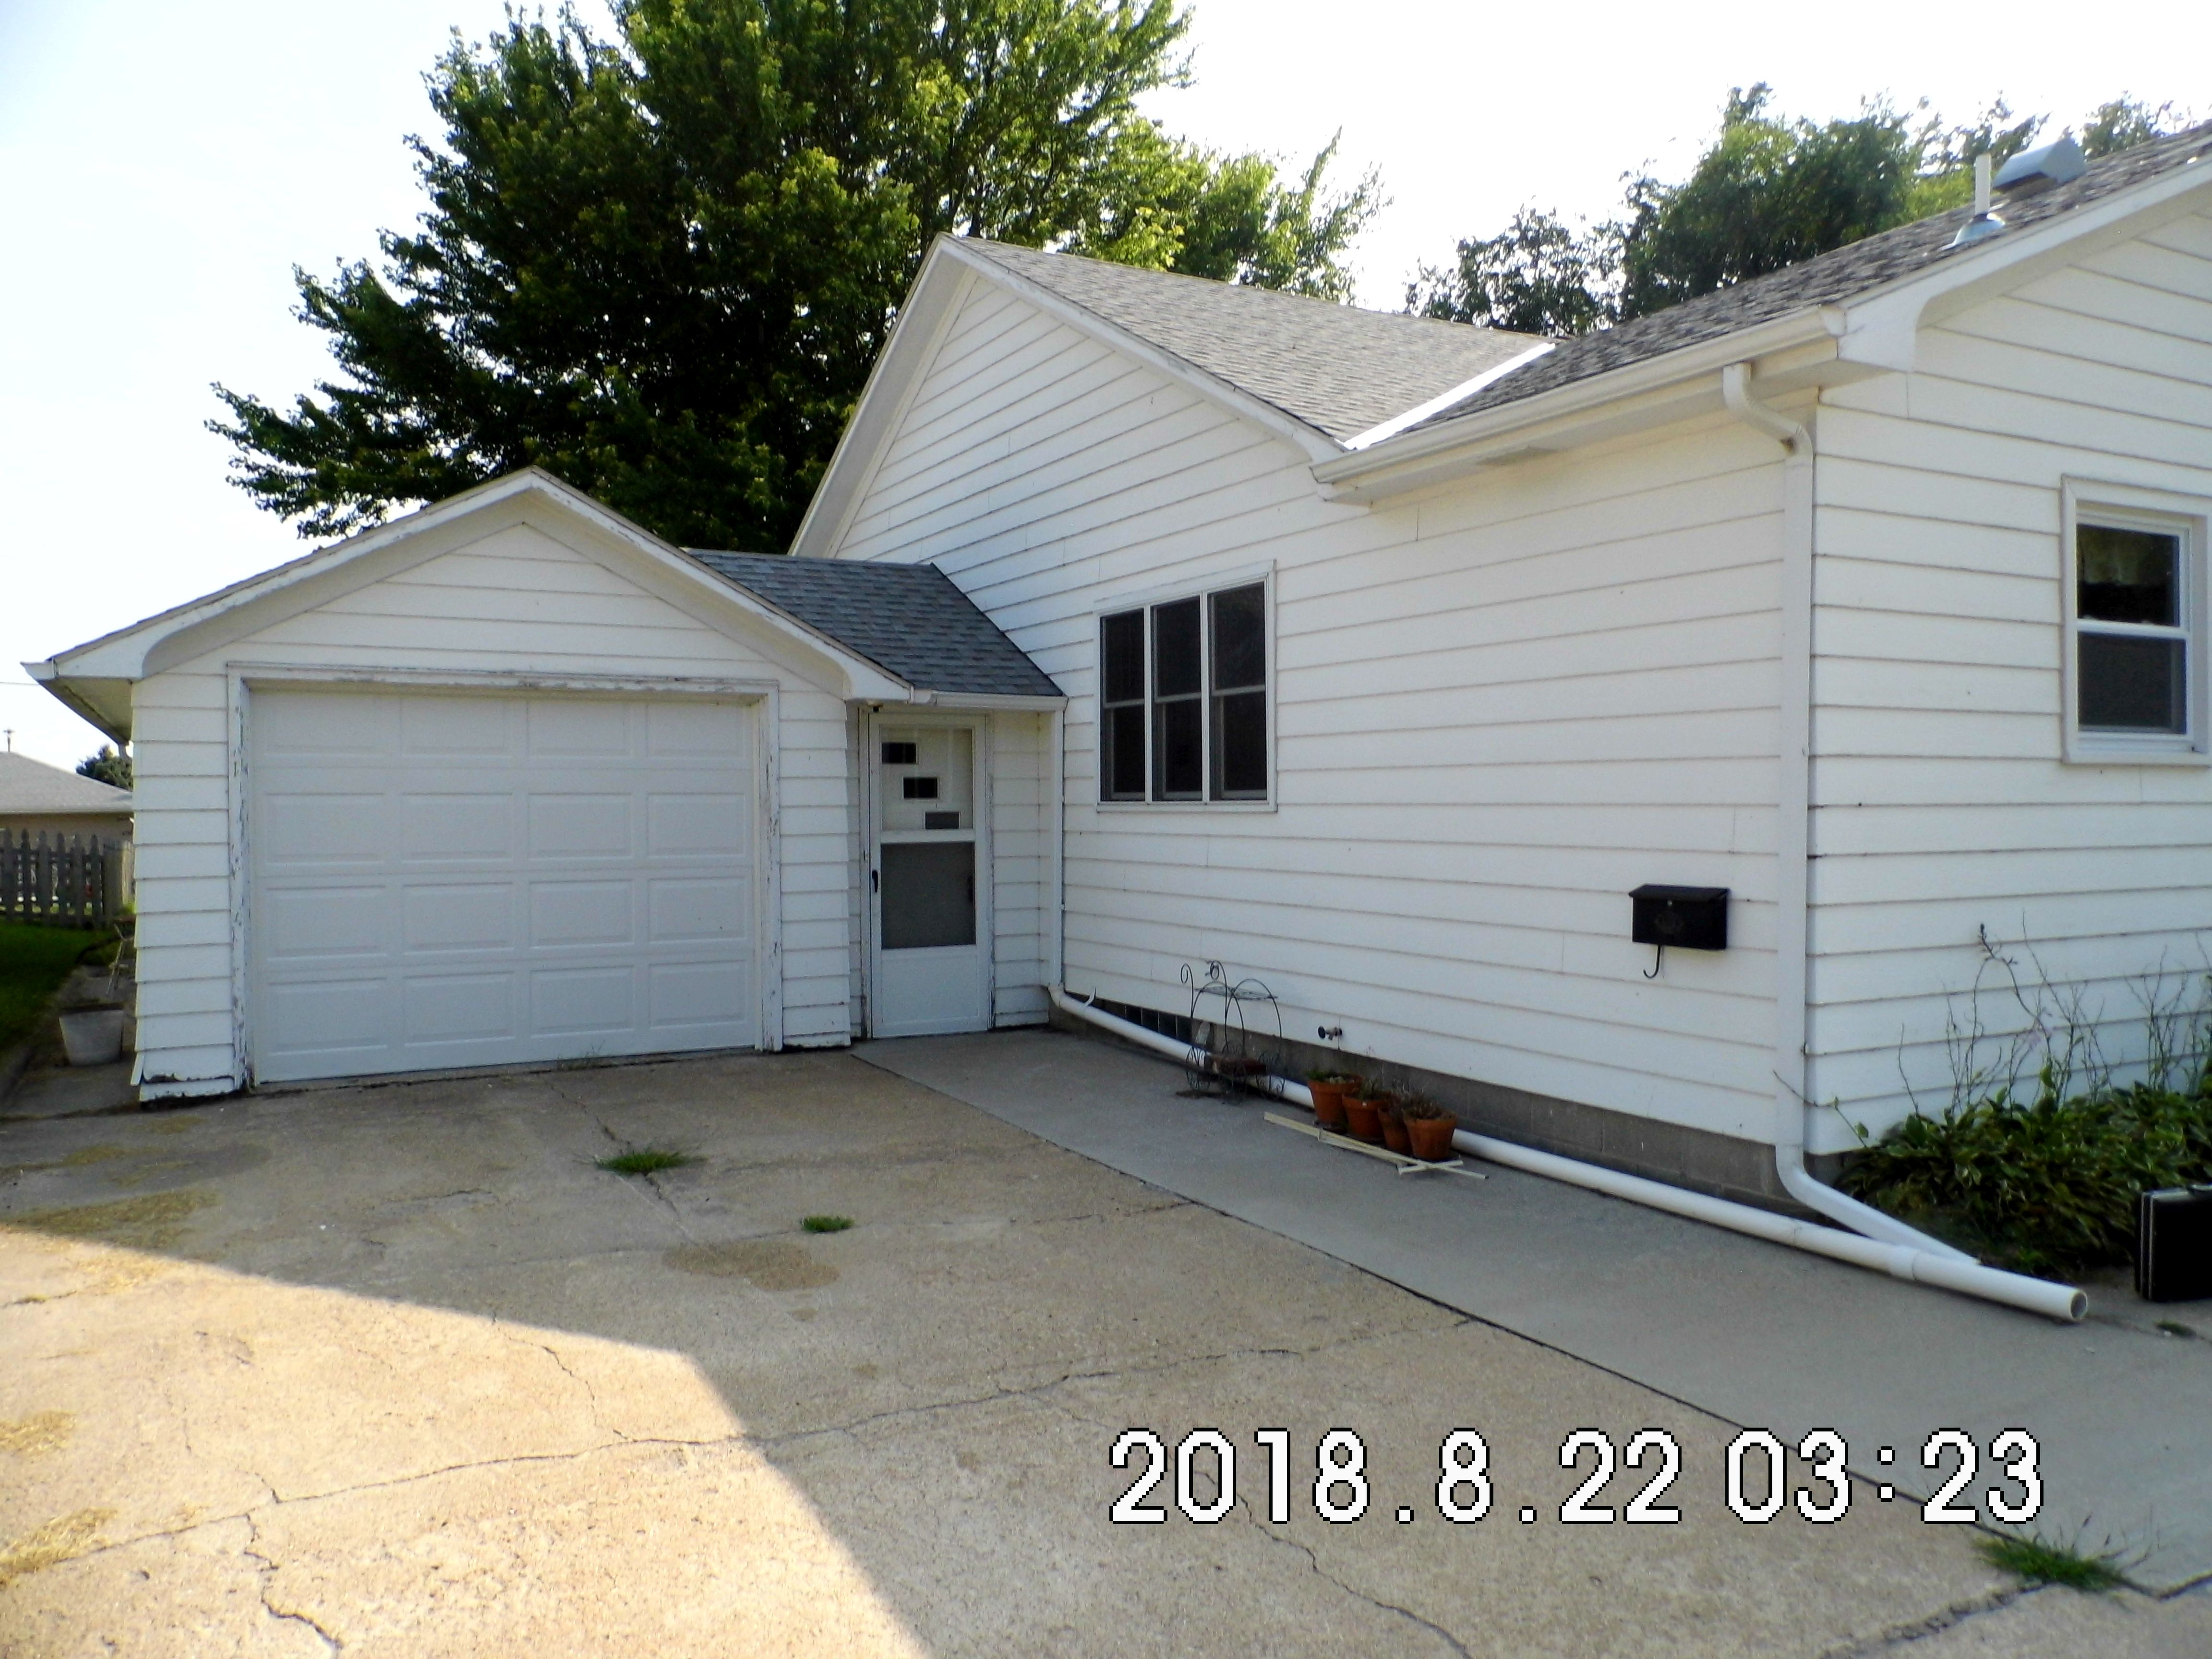 1.4 303 Elm St. Garage Front